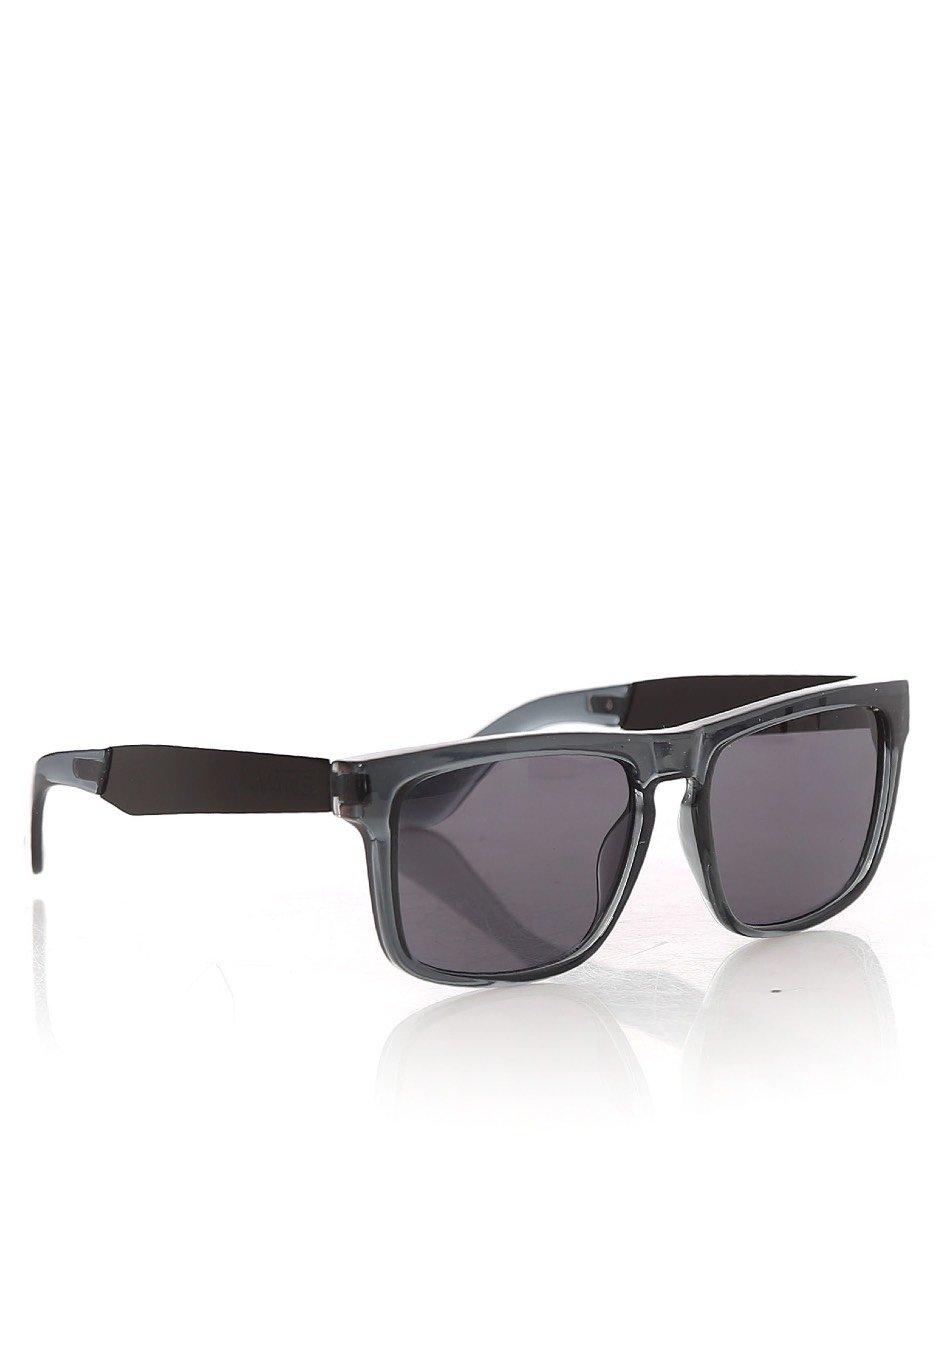 4fe2eb3ee7 Vans - Squared Off Shades Dark Slate - Sunglasses - Impericon.com UK